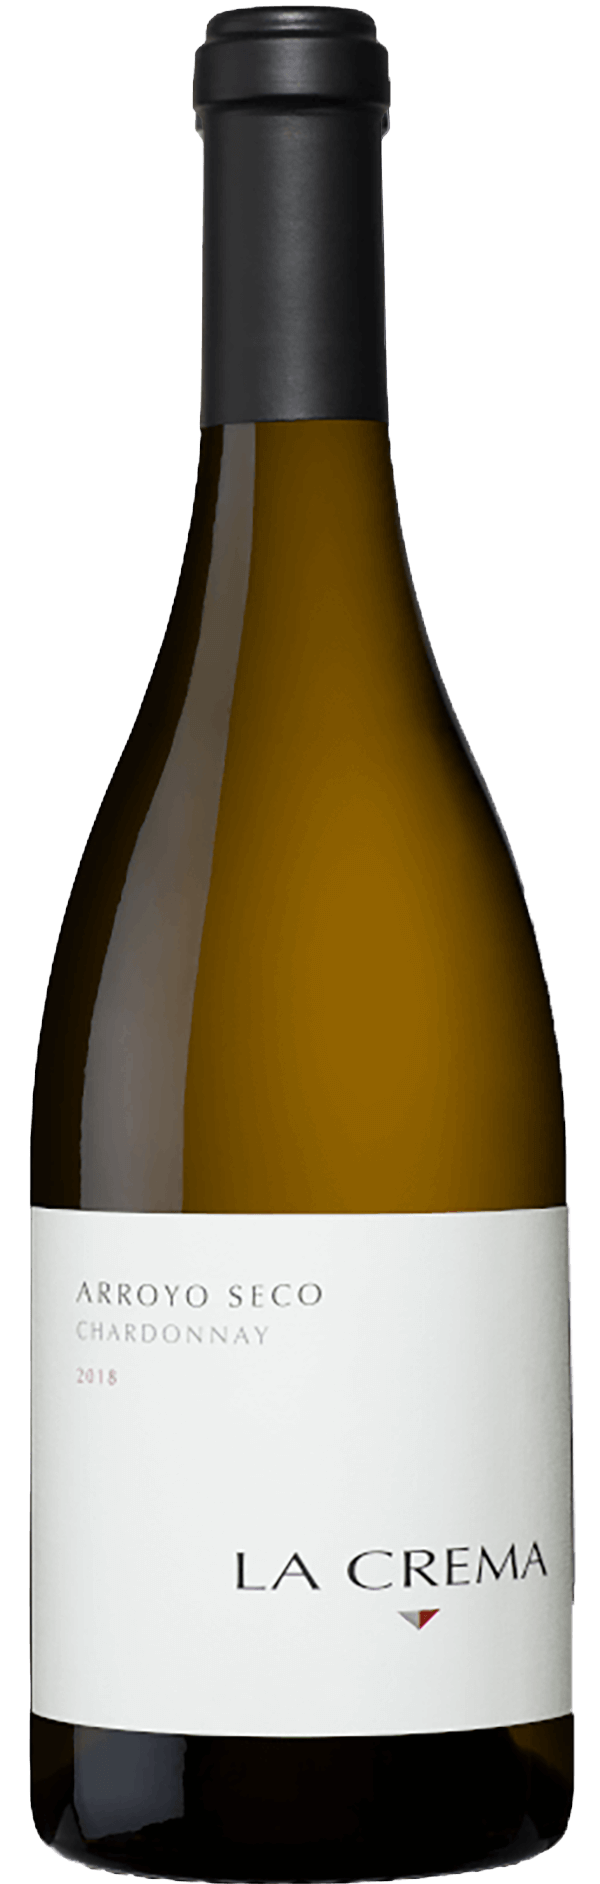 2018 Arroyo Seco Chardonnay